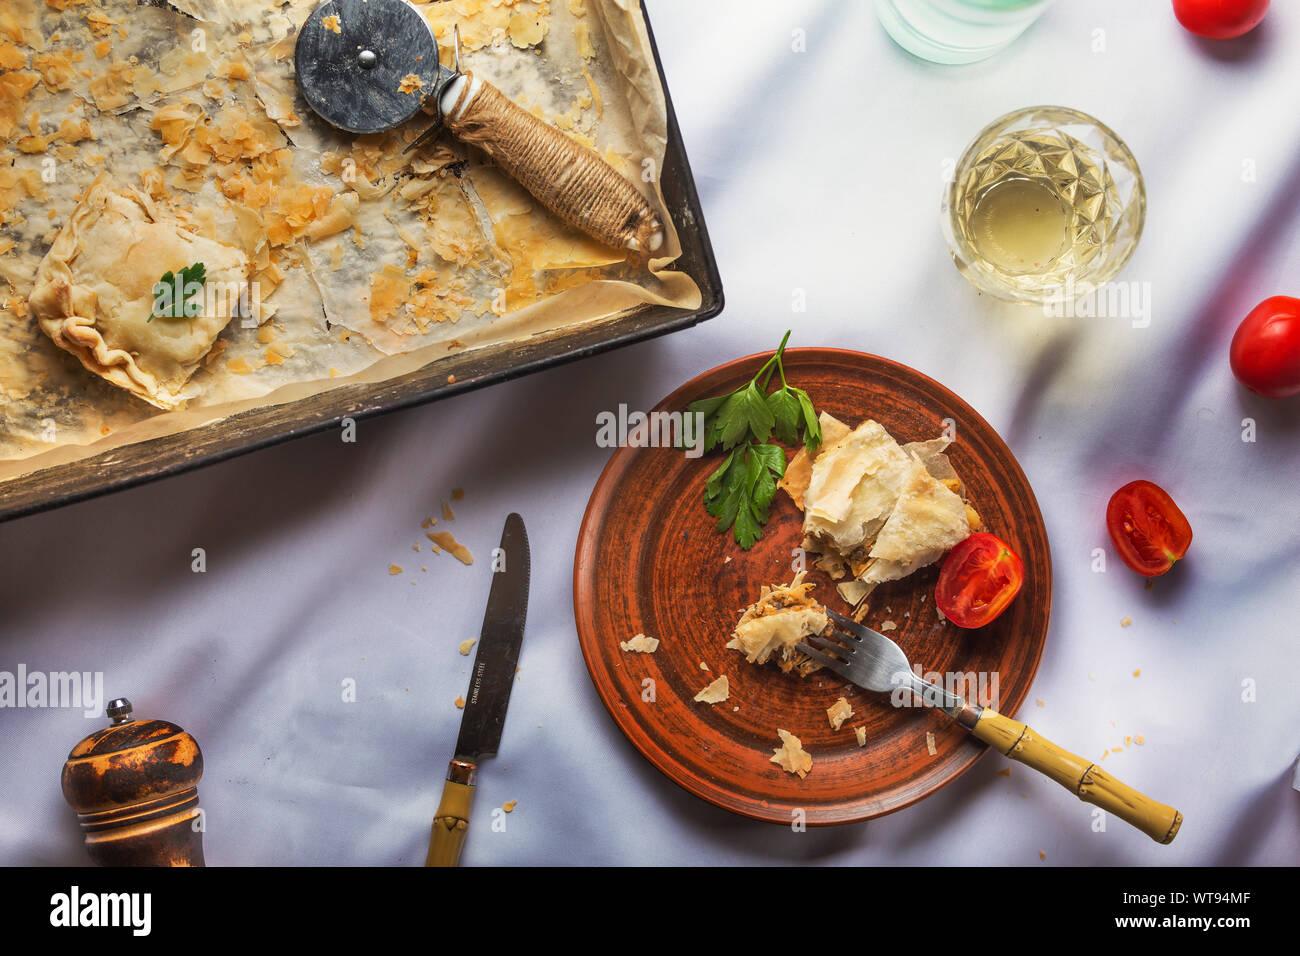 christmas dinner, thanksgiving dinner, thanksgiving decorations, dinner, puff pastry, table runner, appetizer recipes, checklist, mississippi, puff Stock Photo